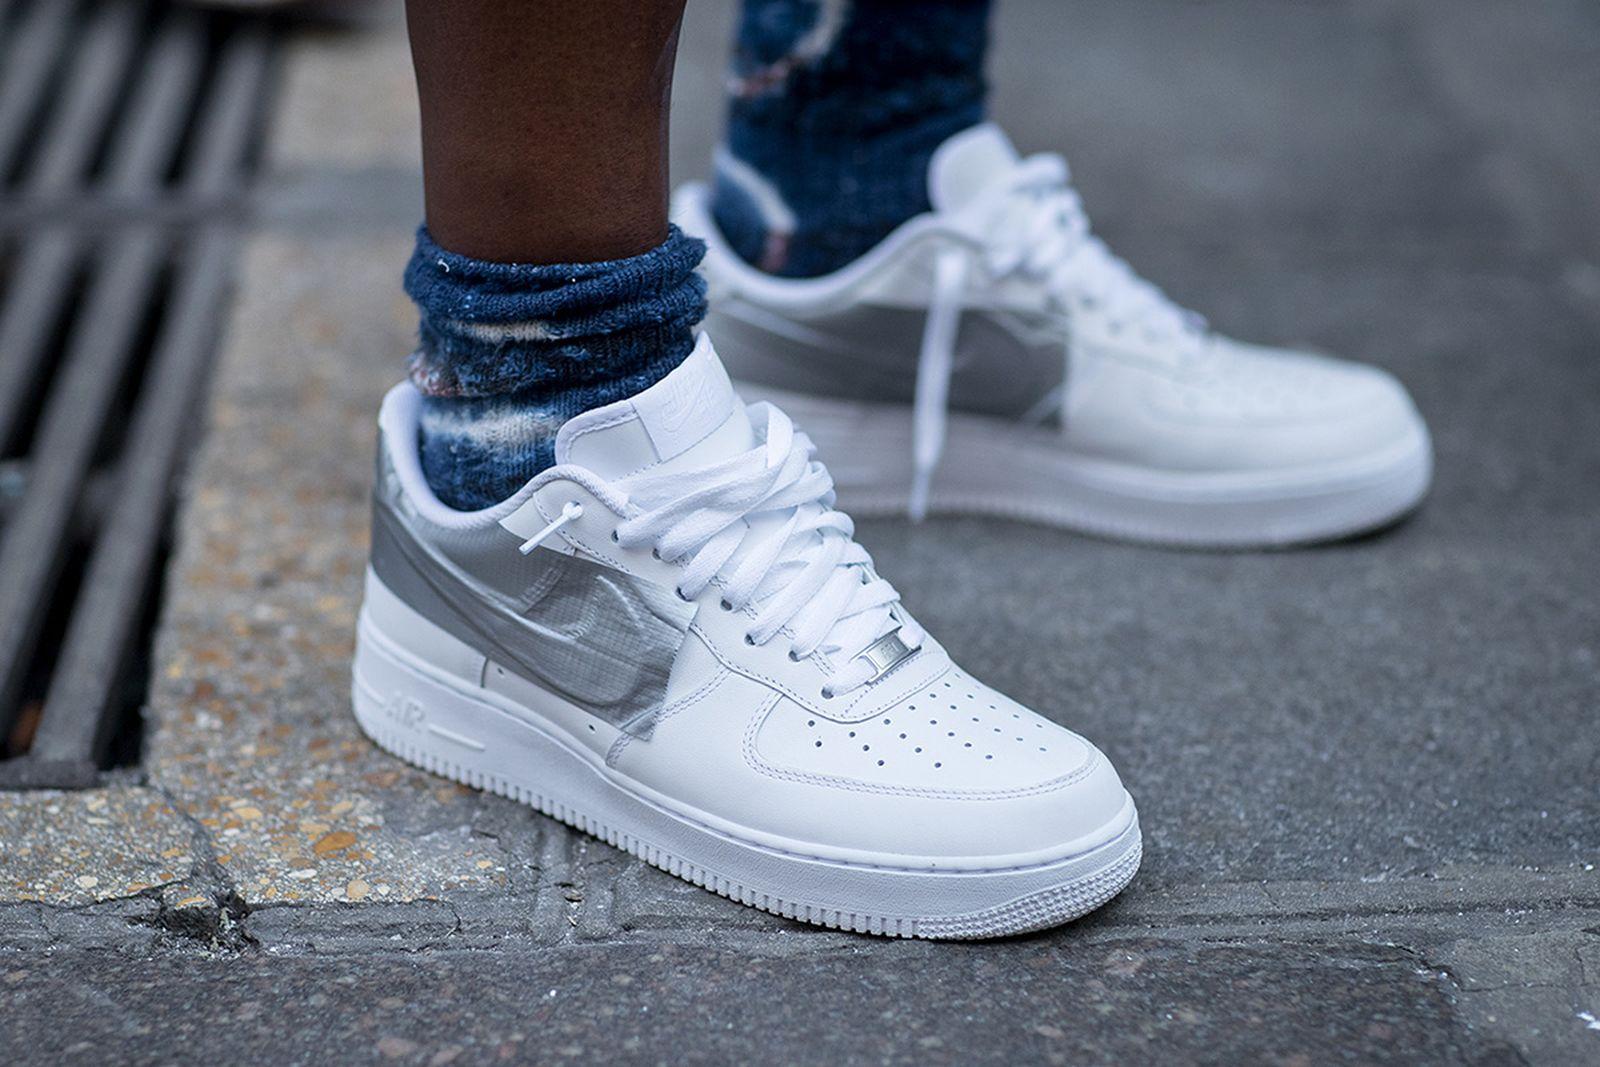 classic sneakers Adidas Air Jordan Nike